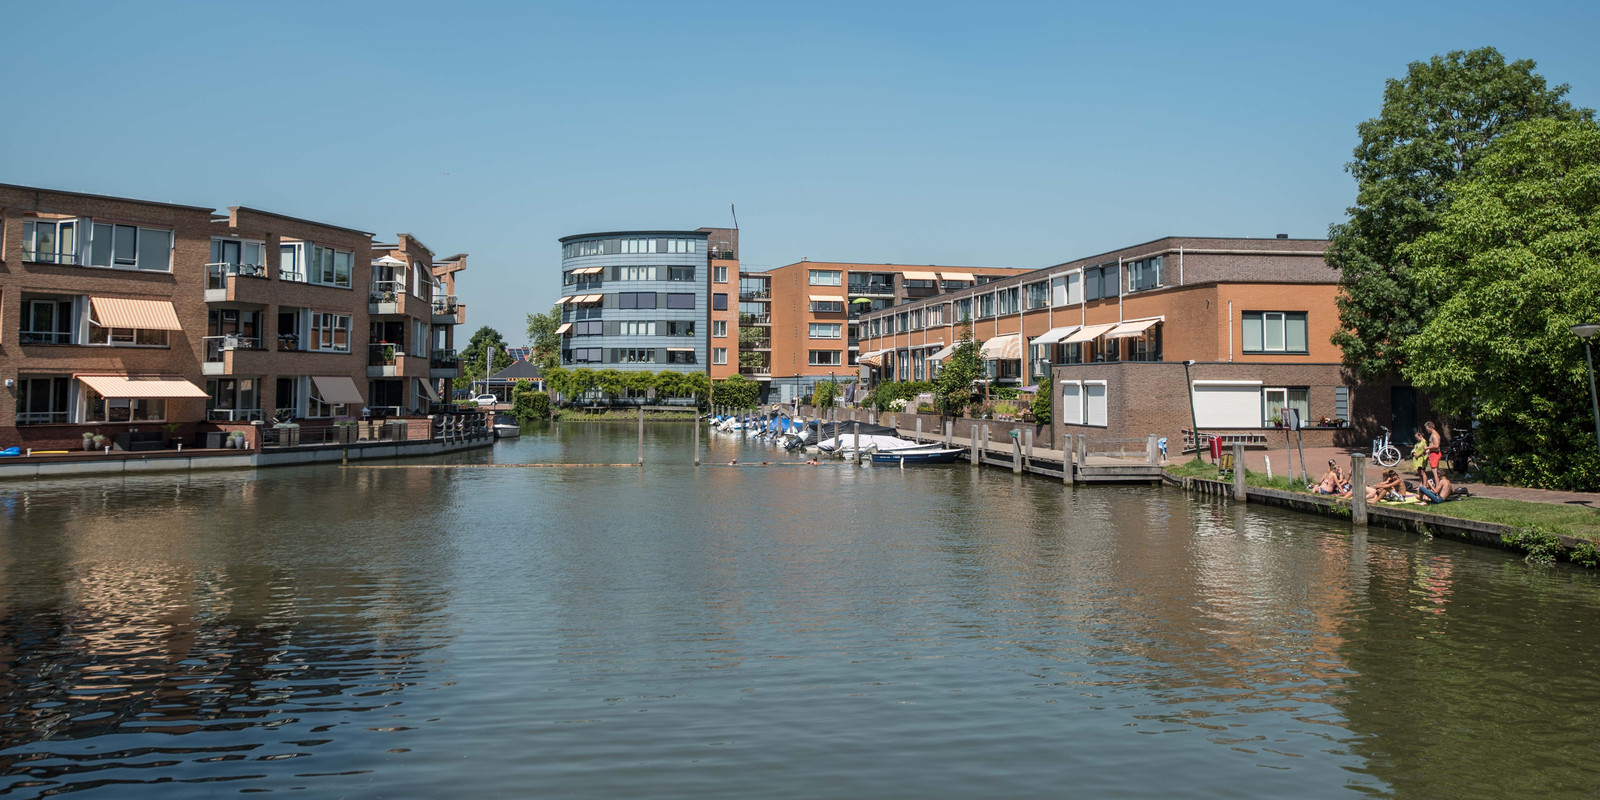 De Giessen in Hardinxveld-Giessendam